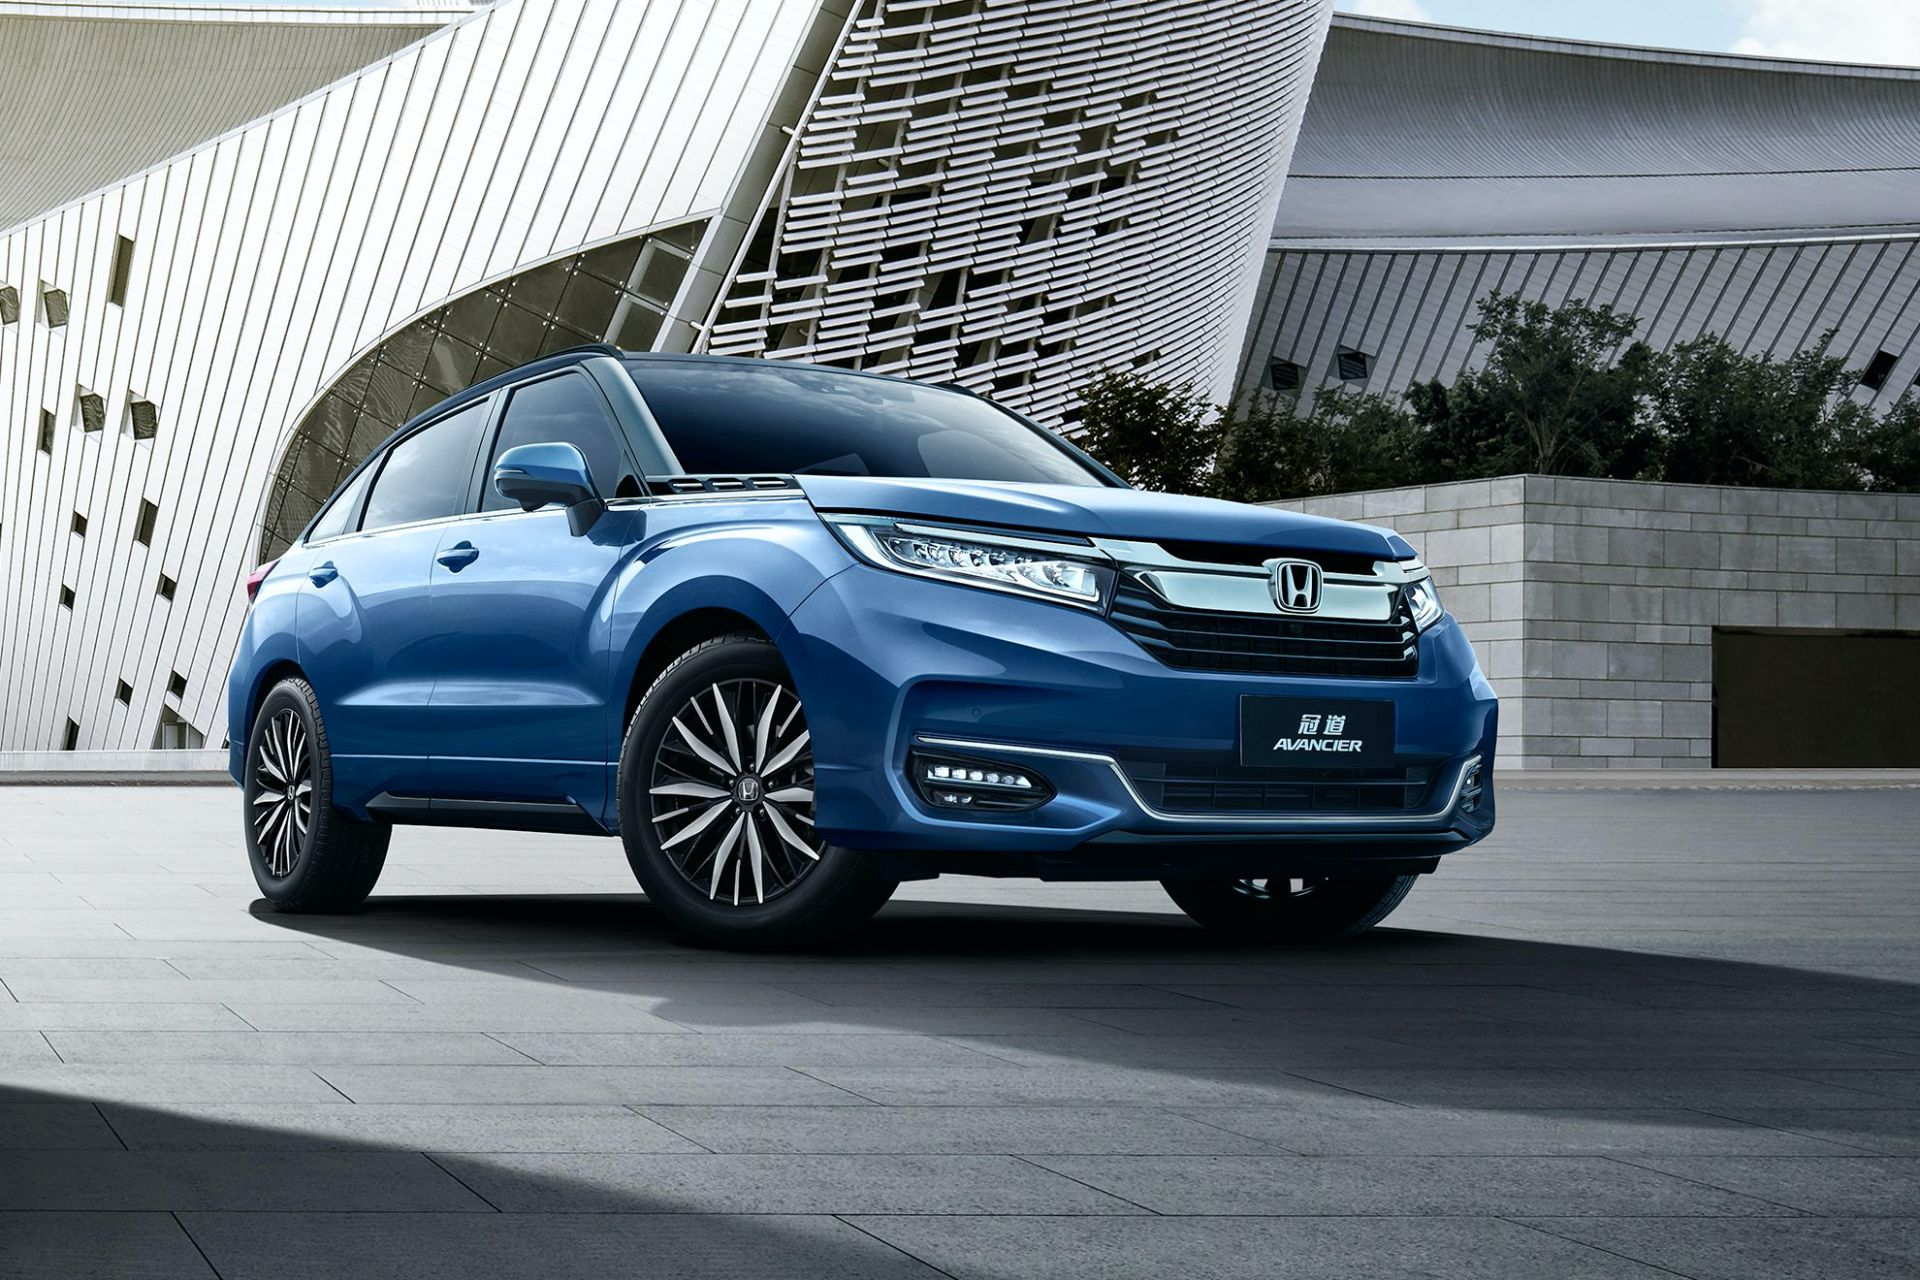 Honda Avancier 2020